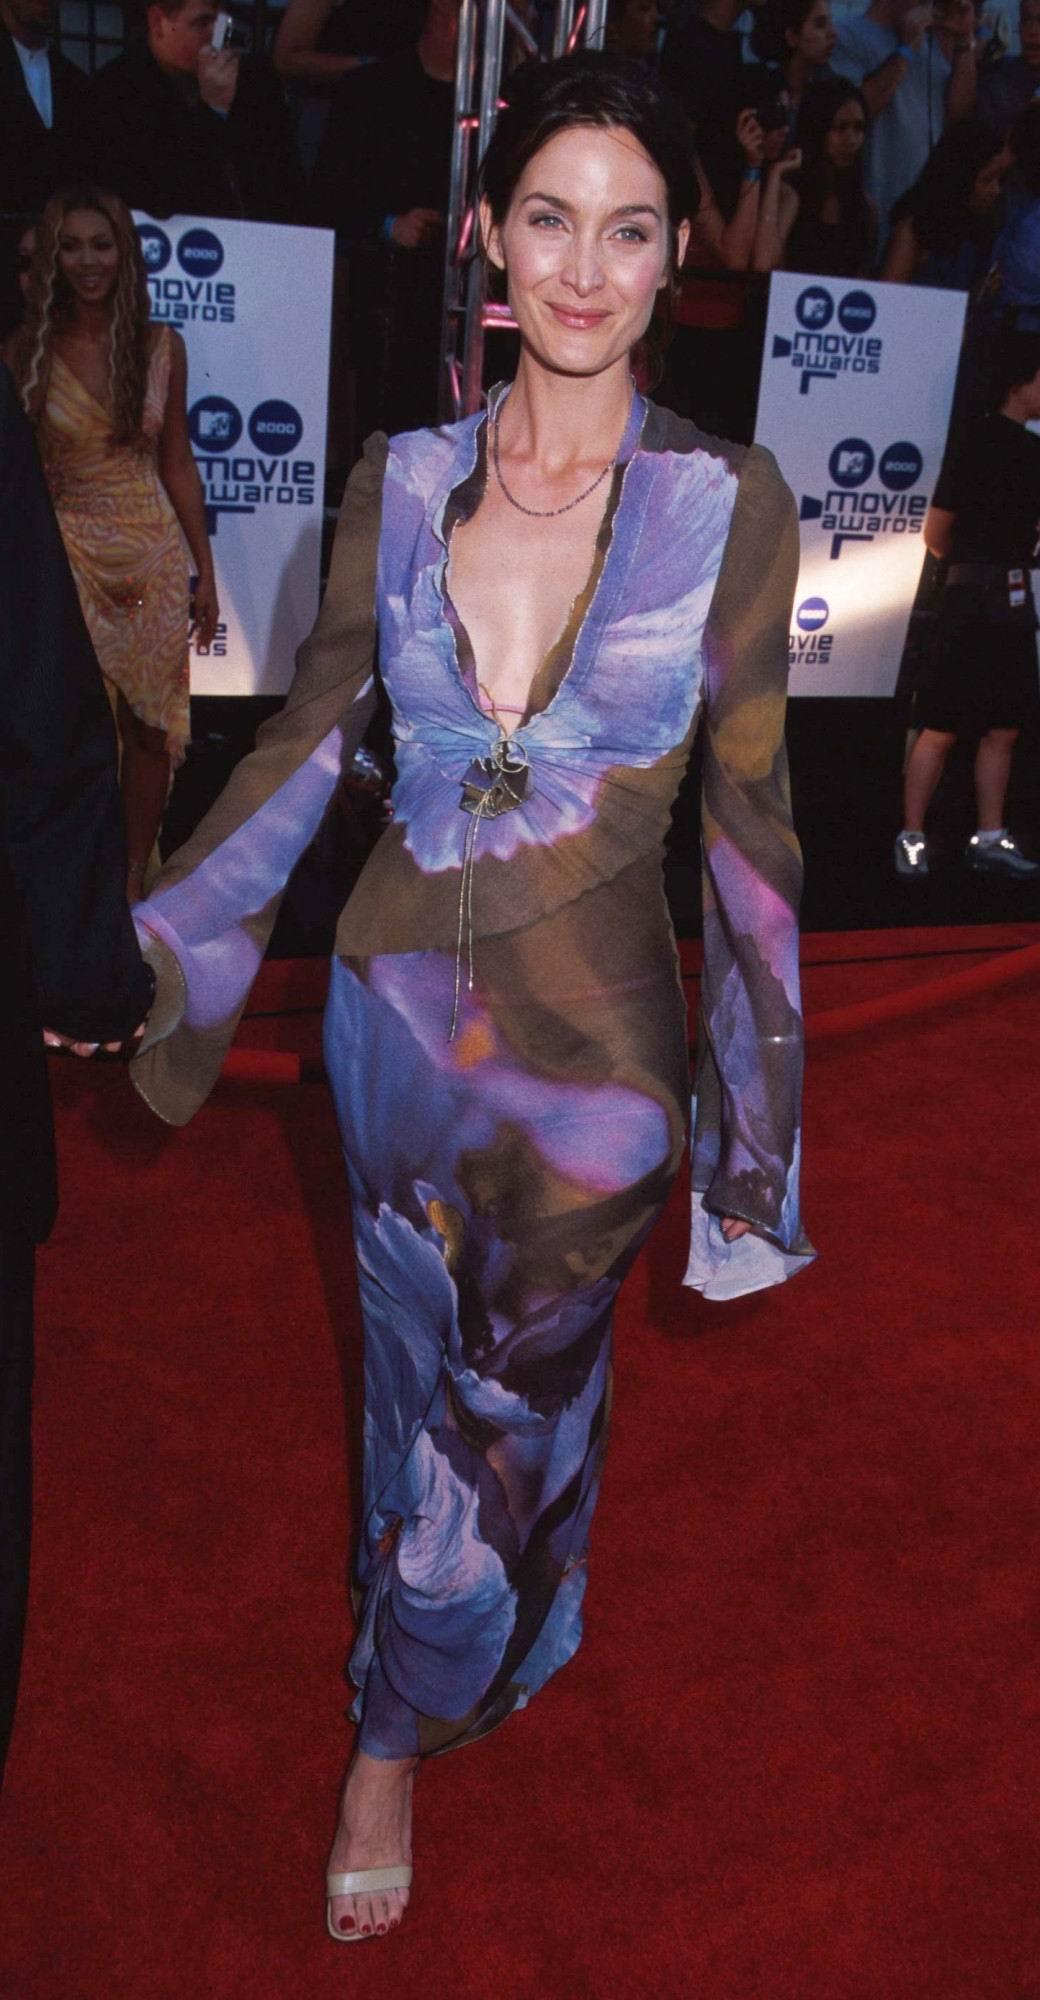 Carrie Anne Moss Desnuda Fotos Y Vídeos Imperiodefamosas